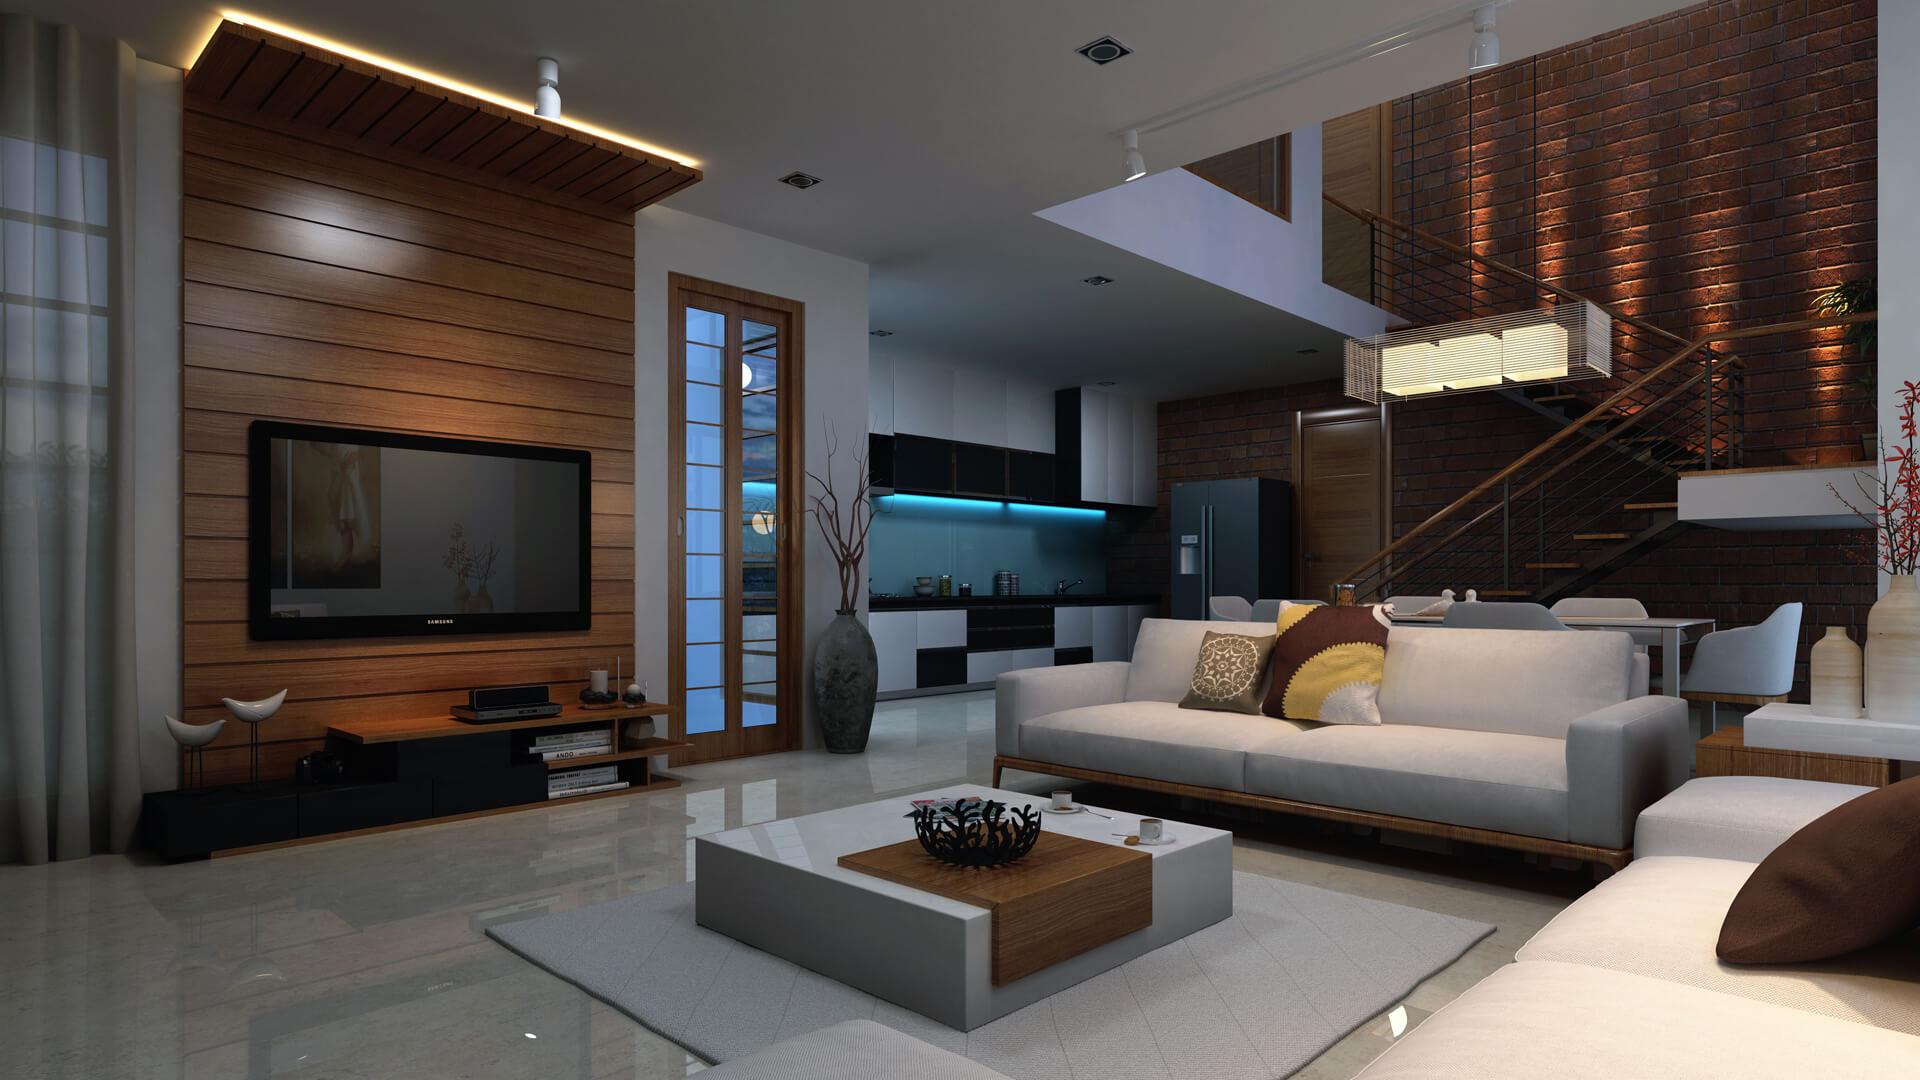 3d Home Bedroom Interior Design on Model Bedroom Interior Design  id=53057